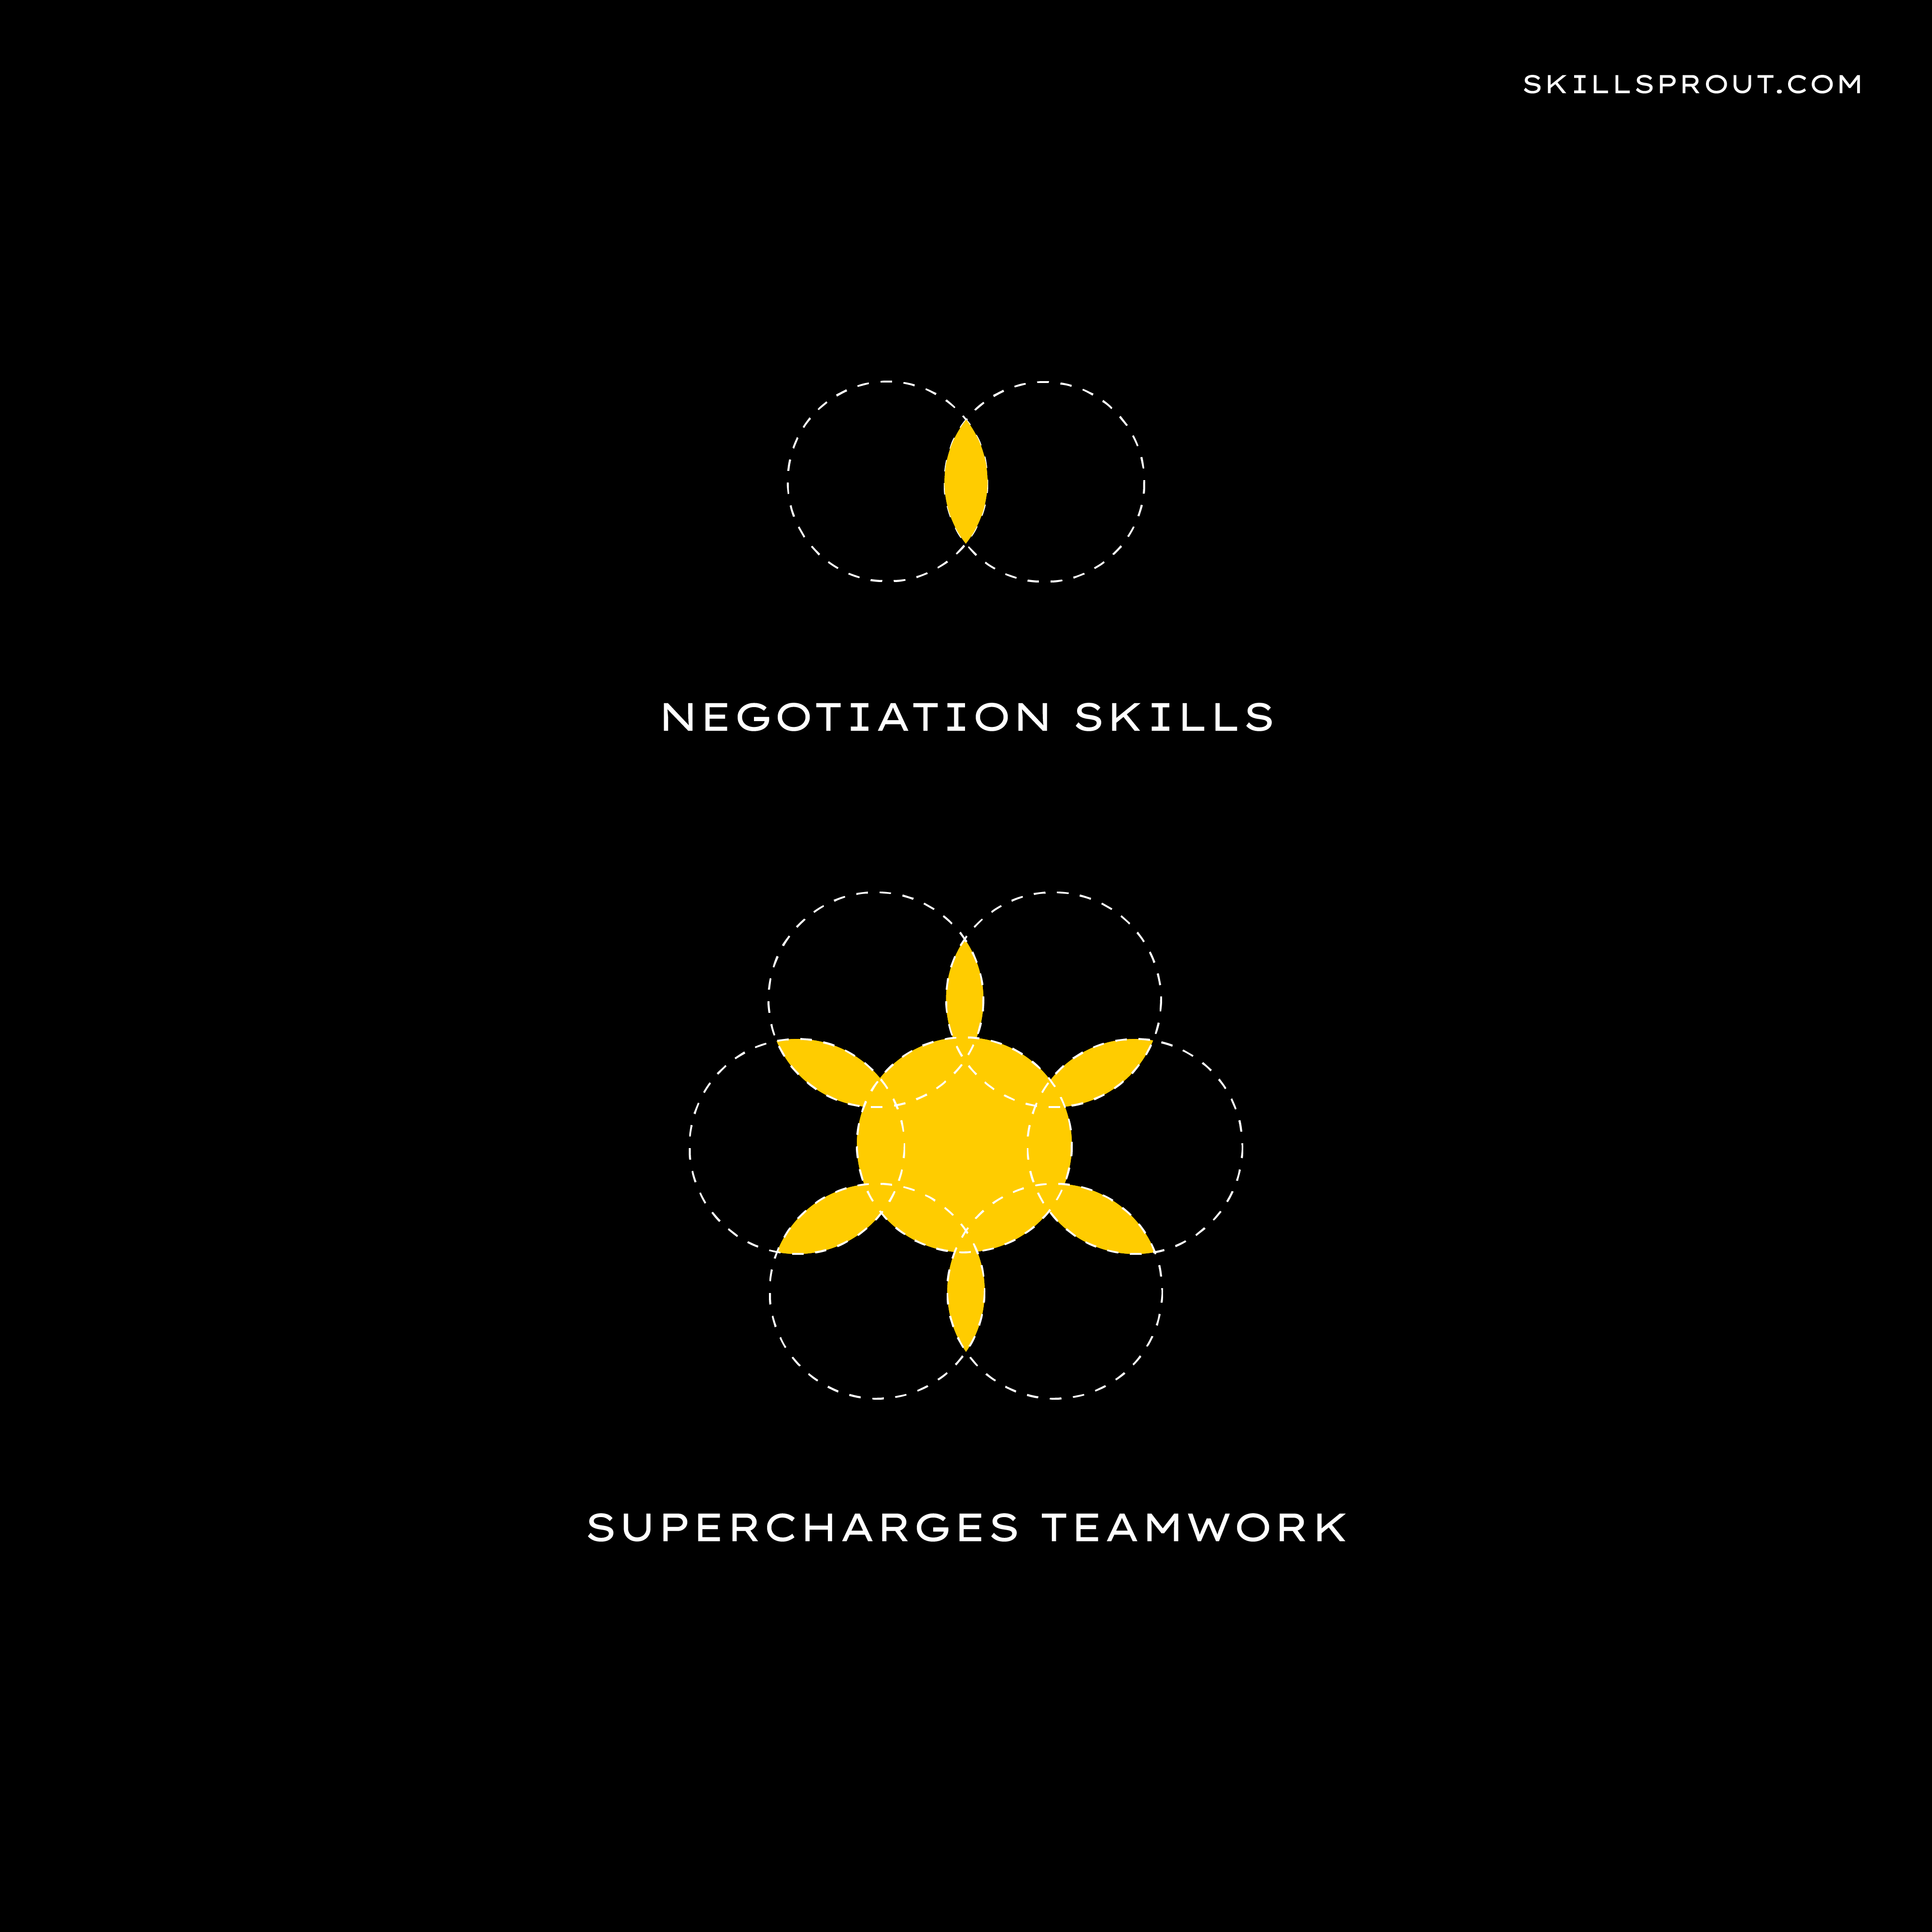 Negotiation skills supercharges teamwork.